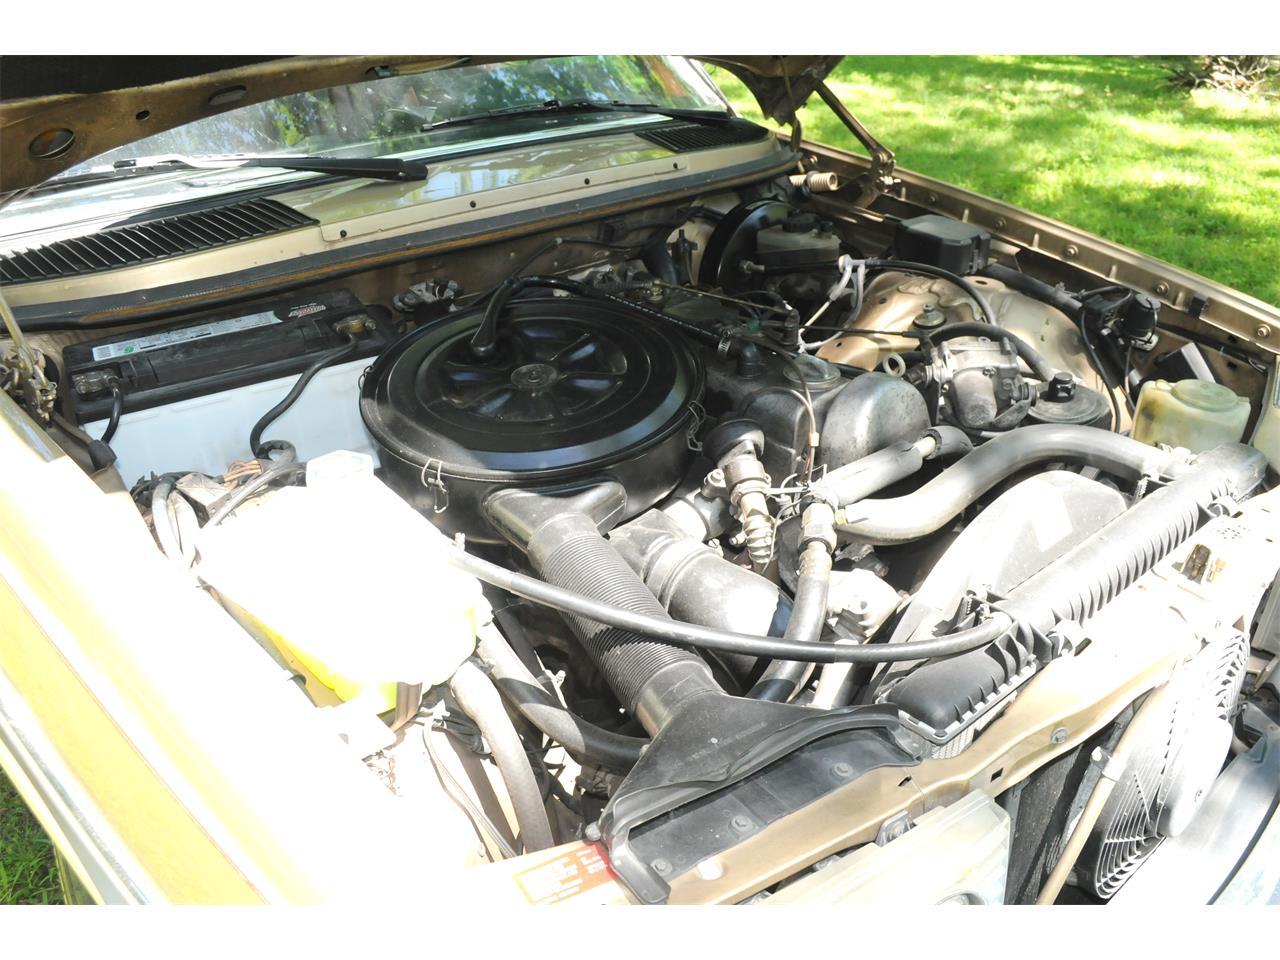 1983 Mercedes-Benz 300CD (CC-1229985) for sale in Tebbetts, Missouri